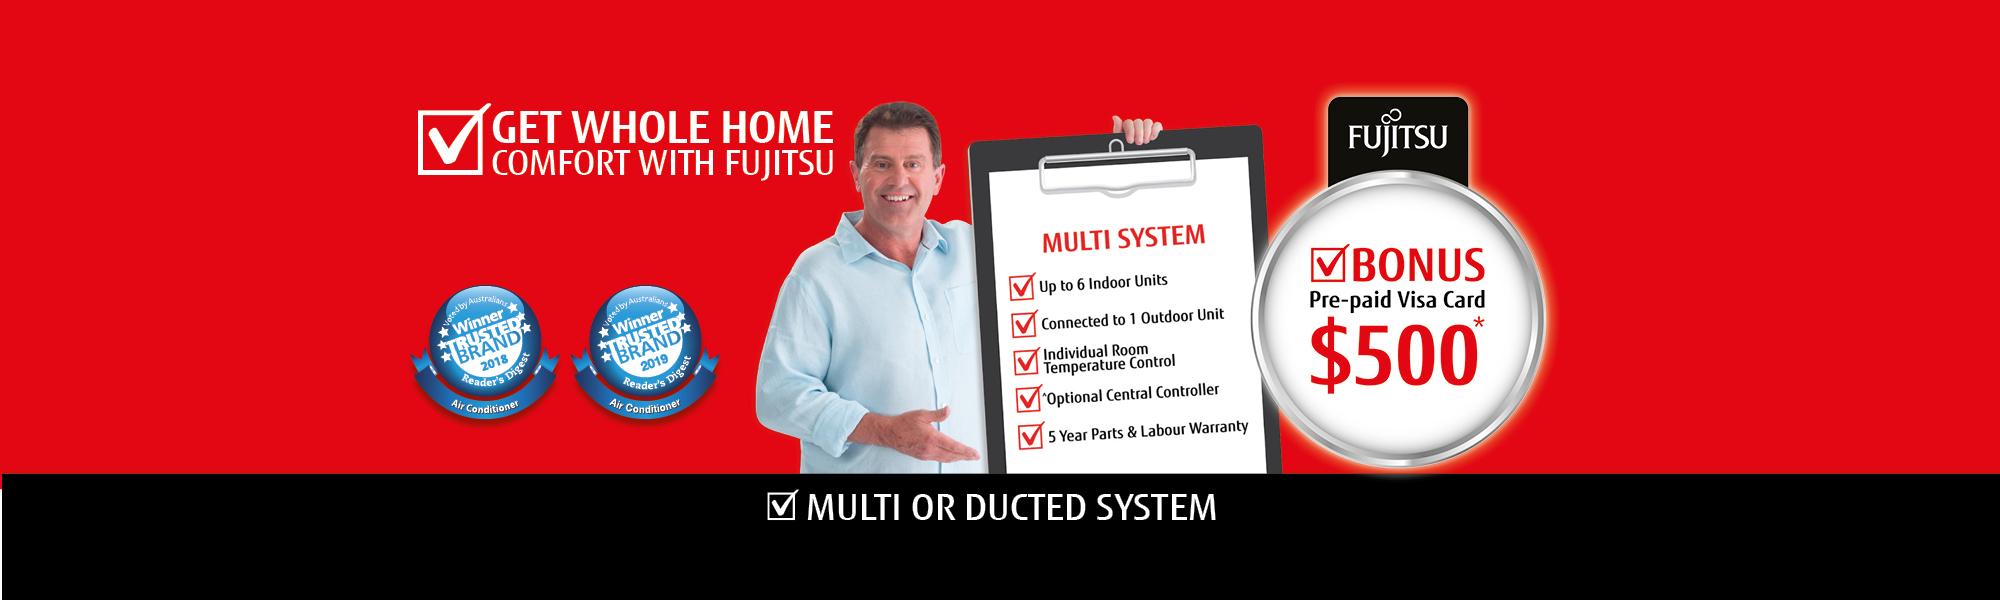 Fujitsu Promo offer